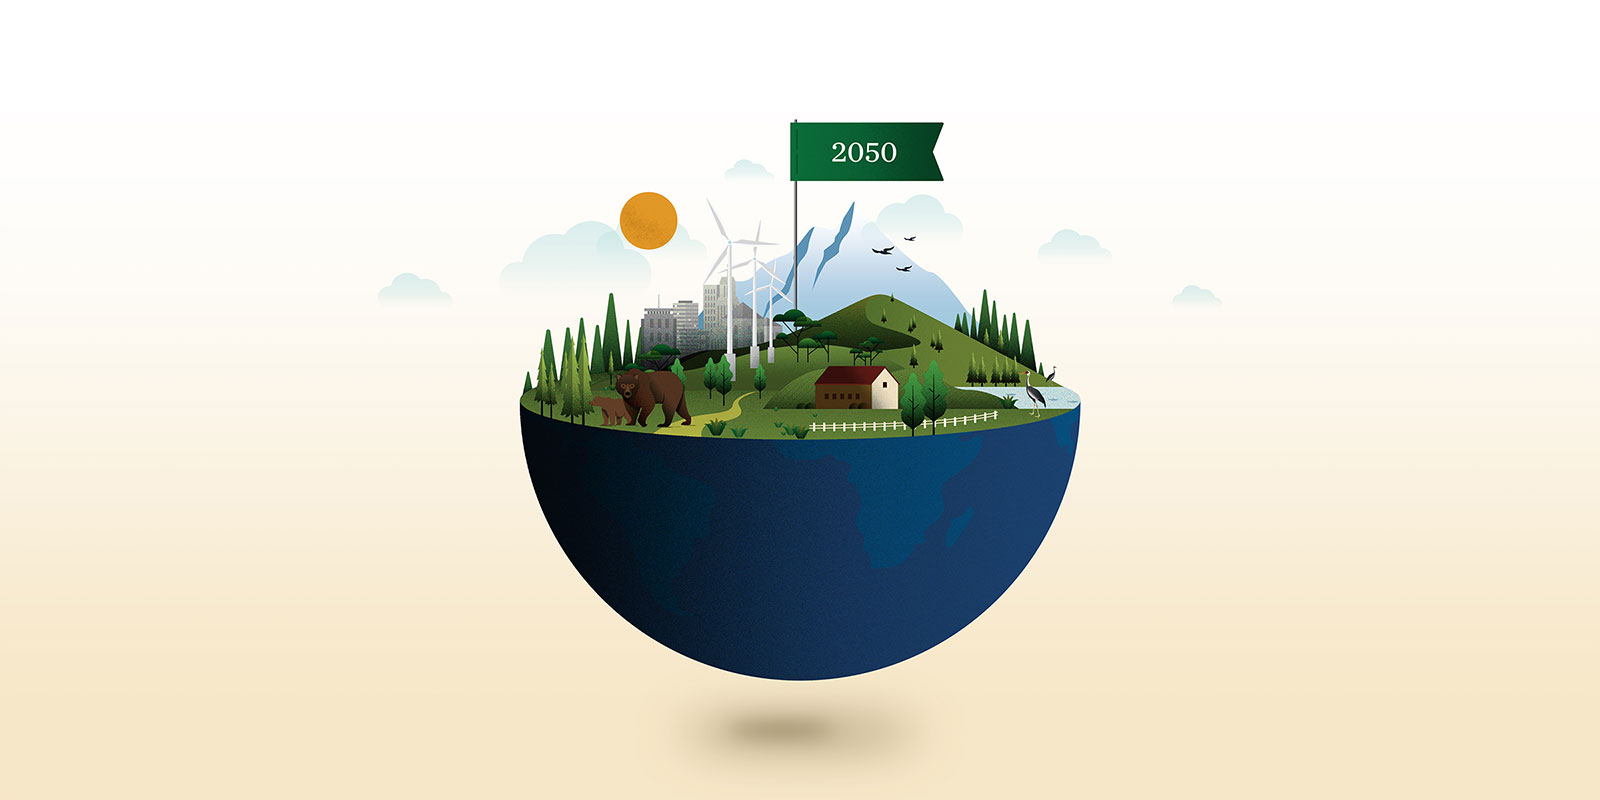 Vision 2050 graphic